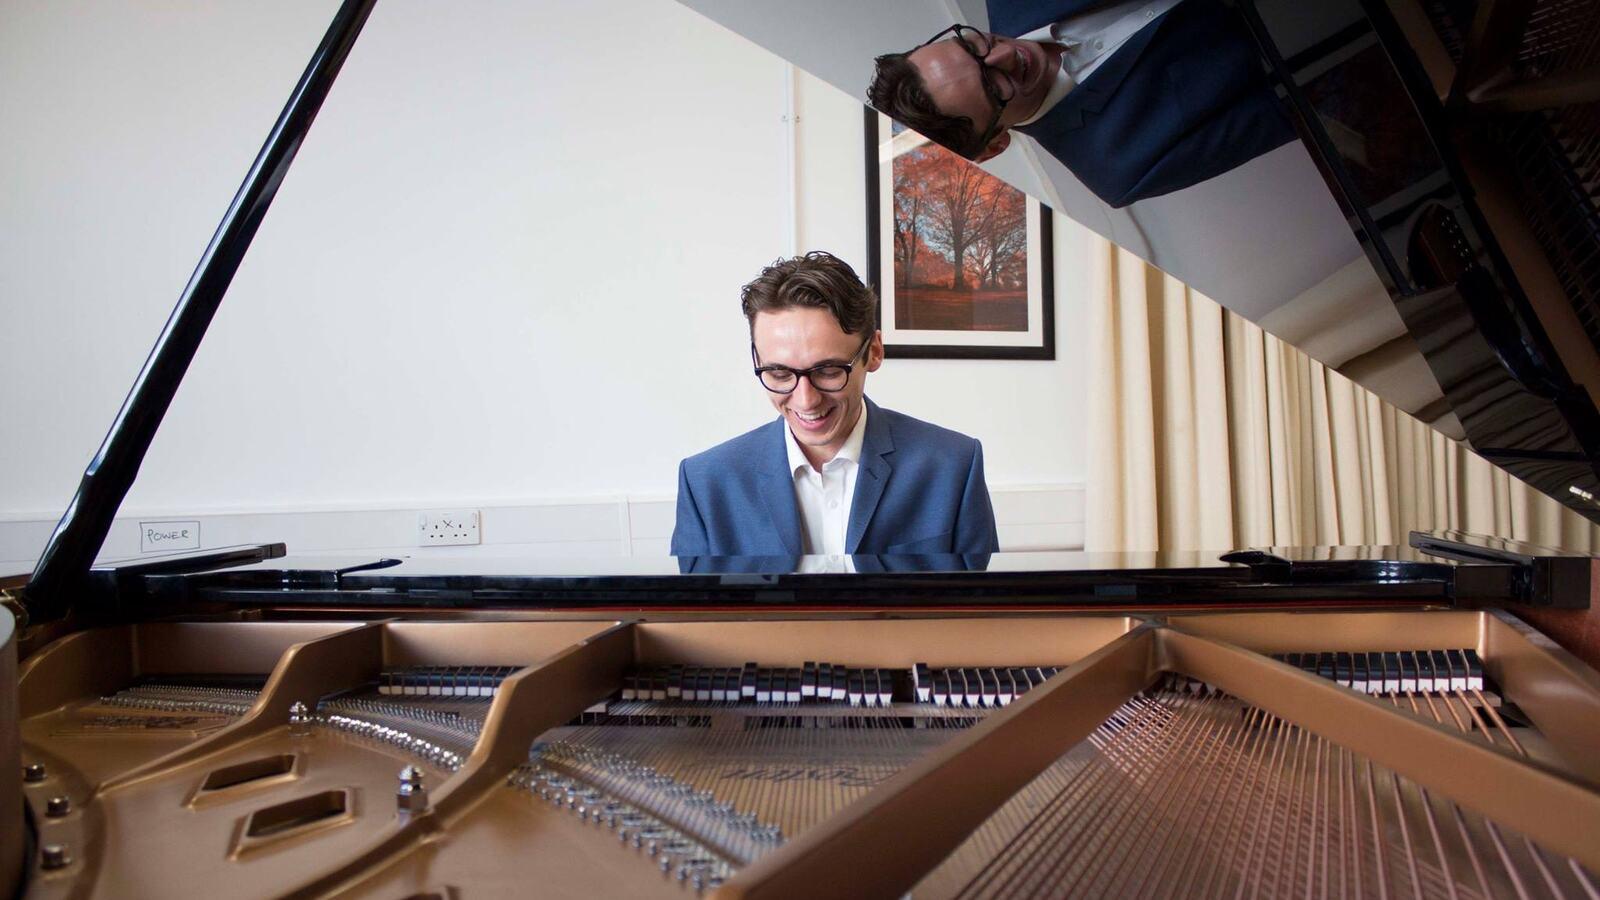 Jack Stephenson-Oliver sat at a grand piano